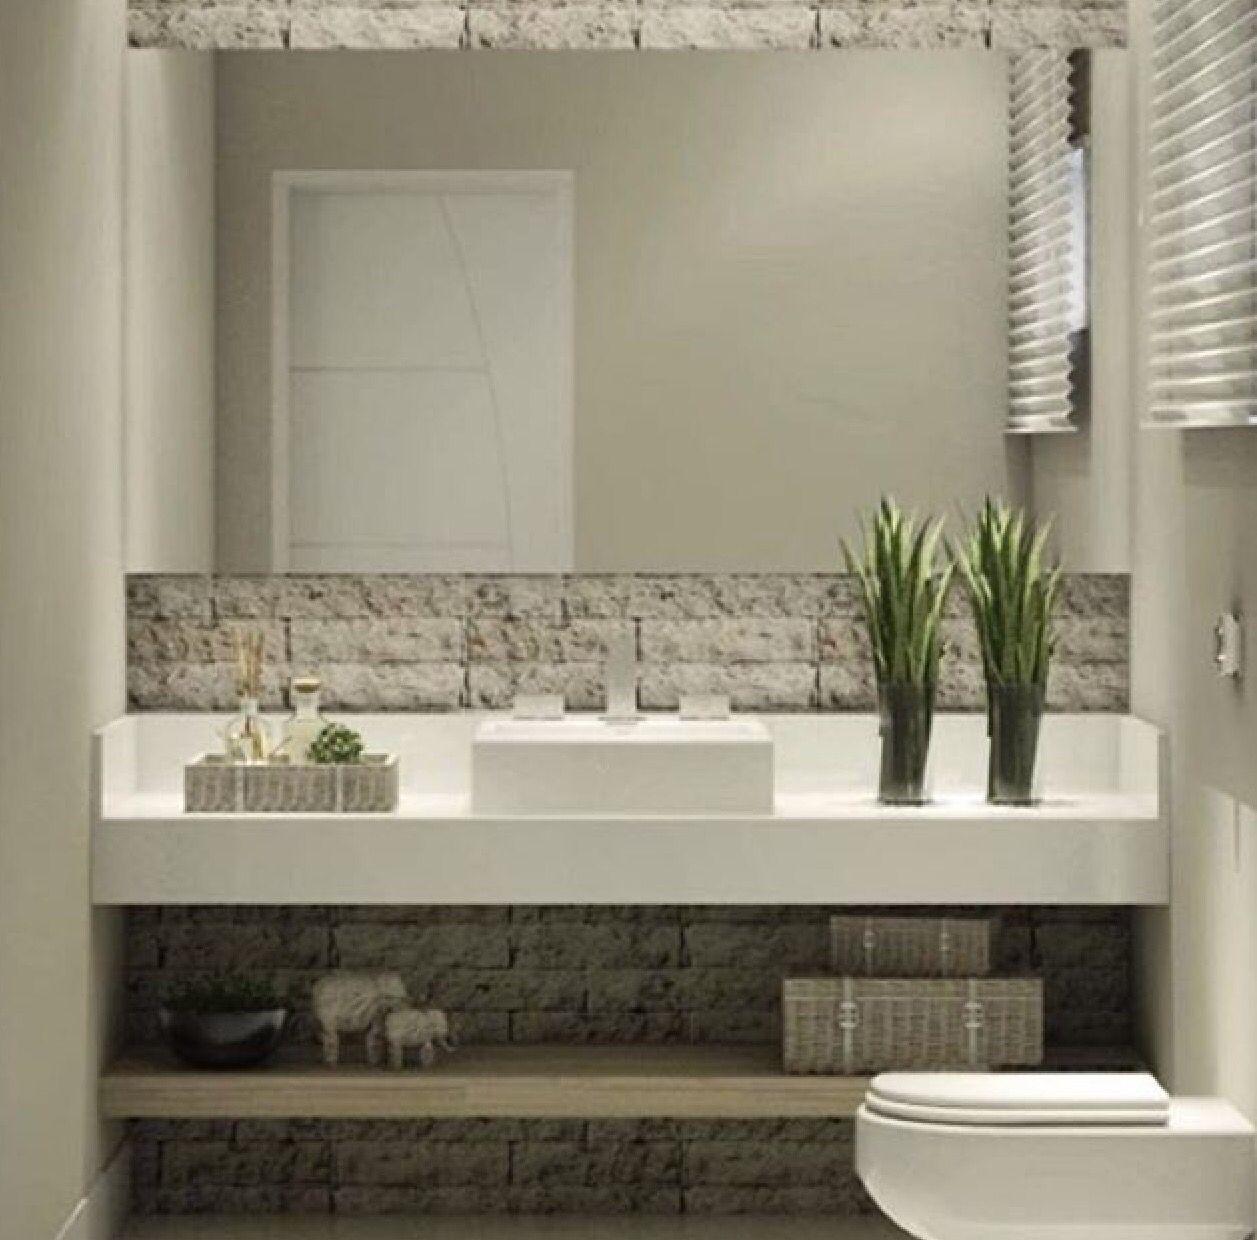 Pared y mueble de obra con pila rectangular ba os for Pilas de lavar con mueble